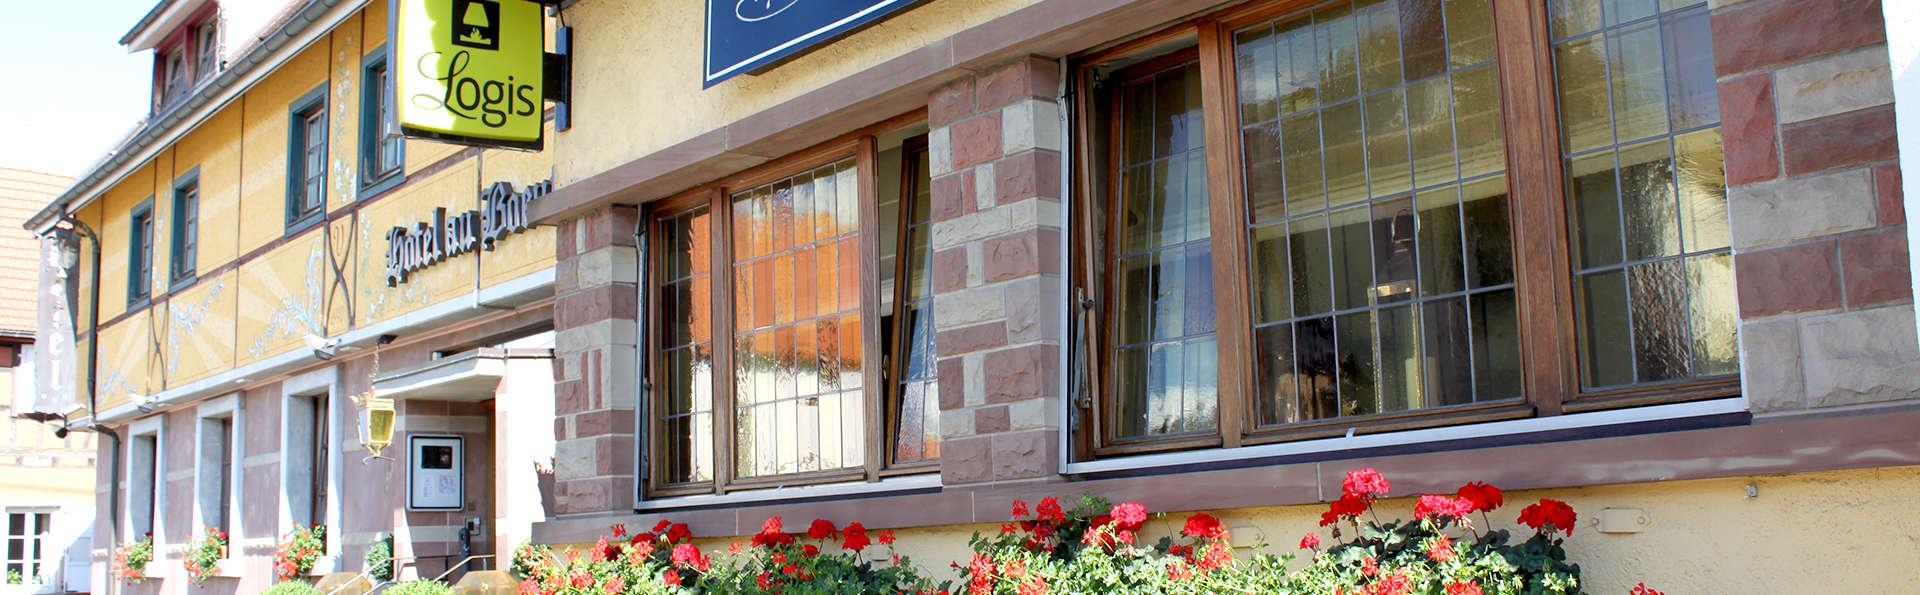 Hôtel Restaurant Au Boeuf - EDIT_fRONT.jpg